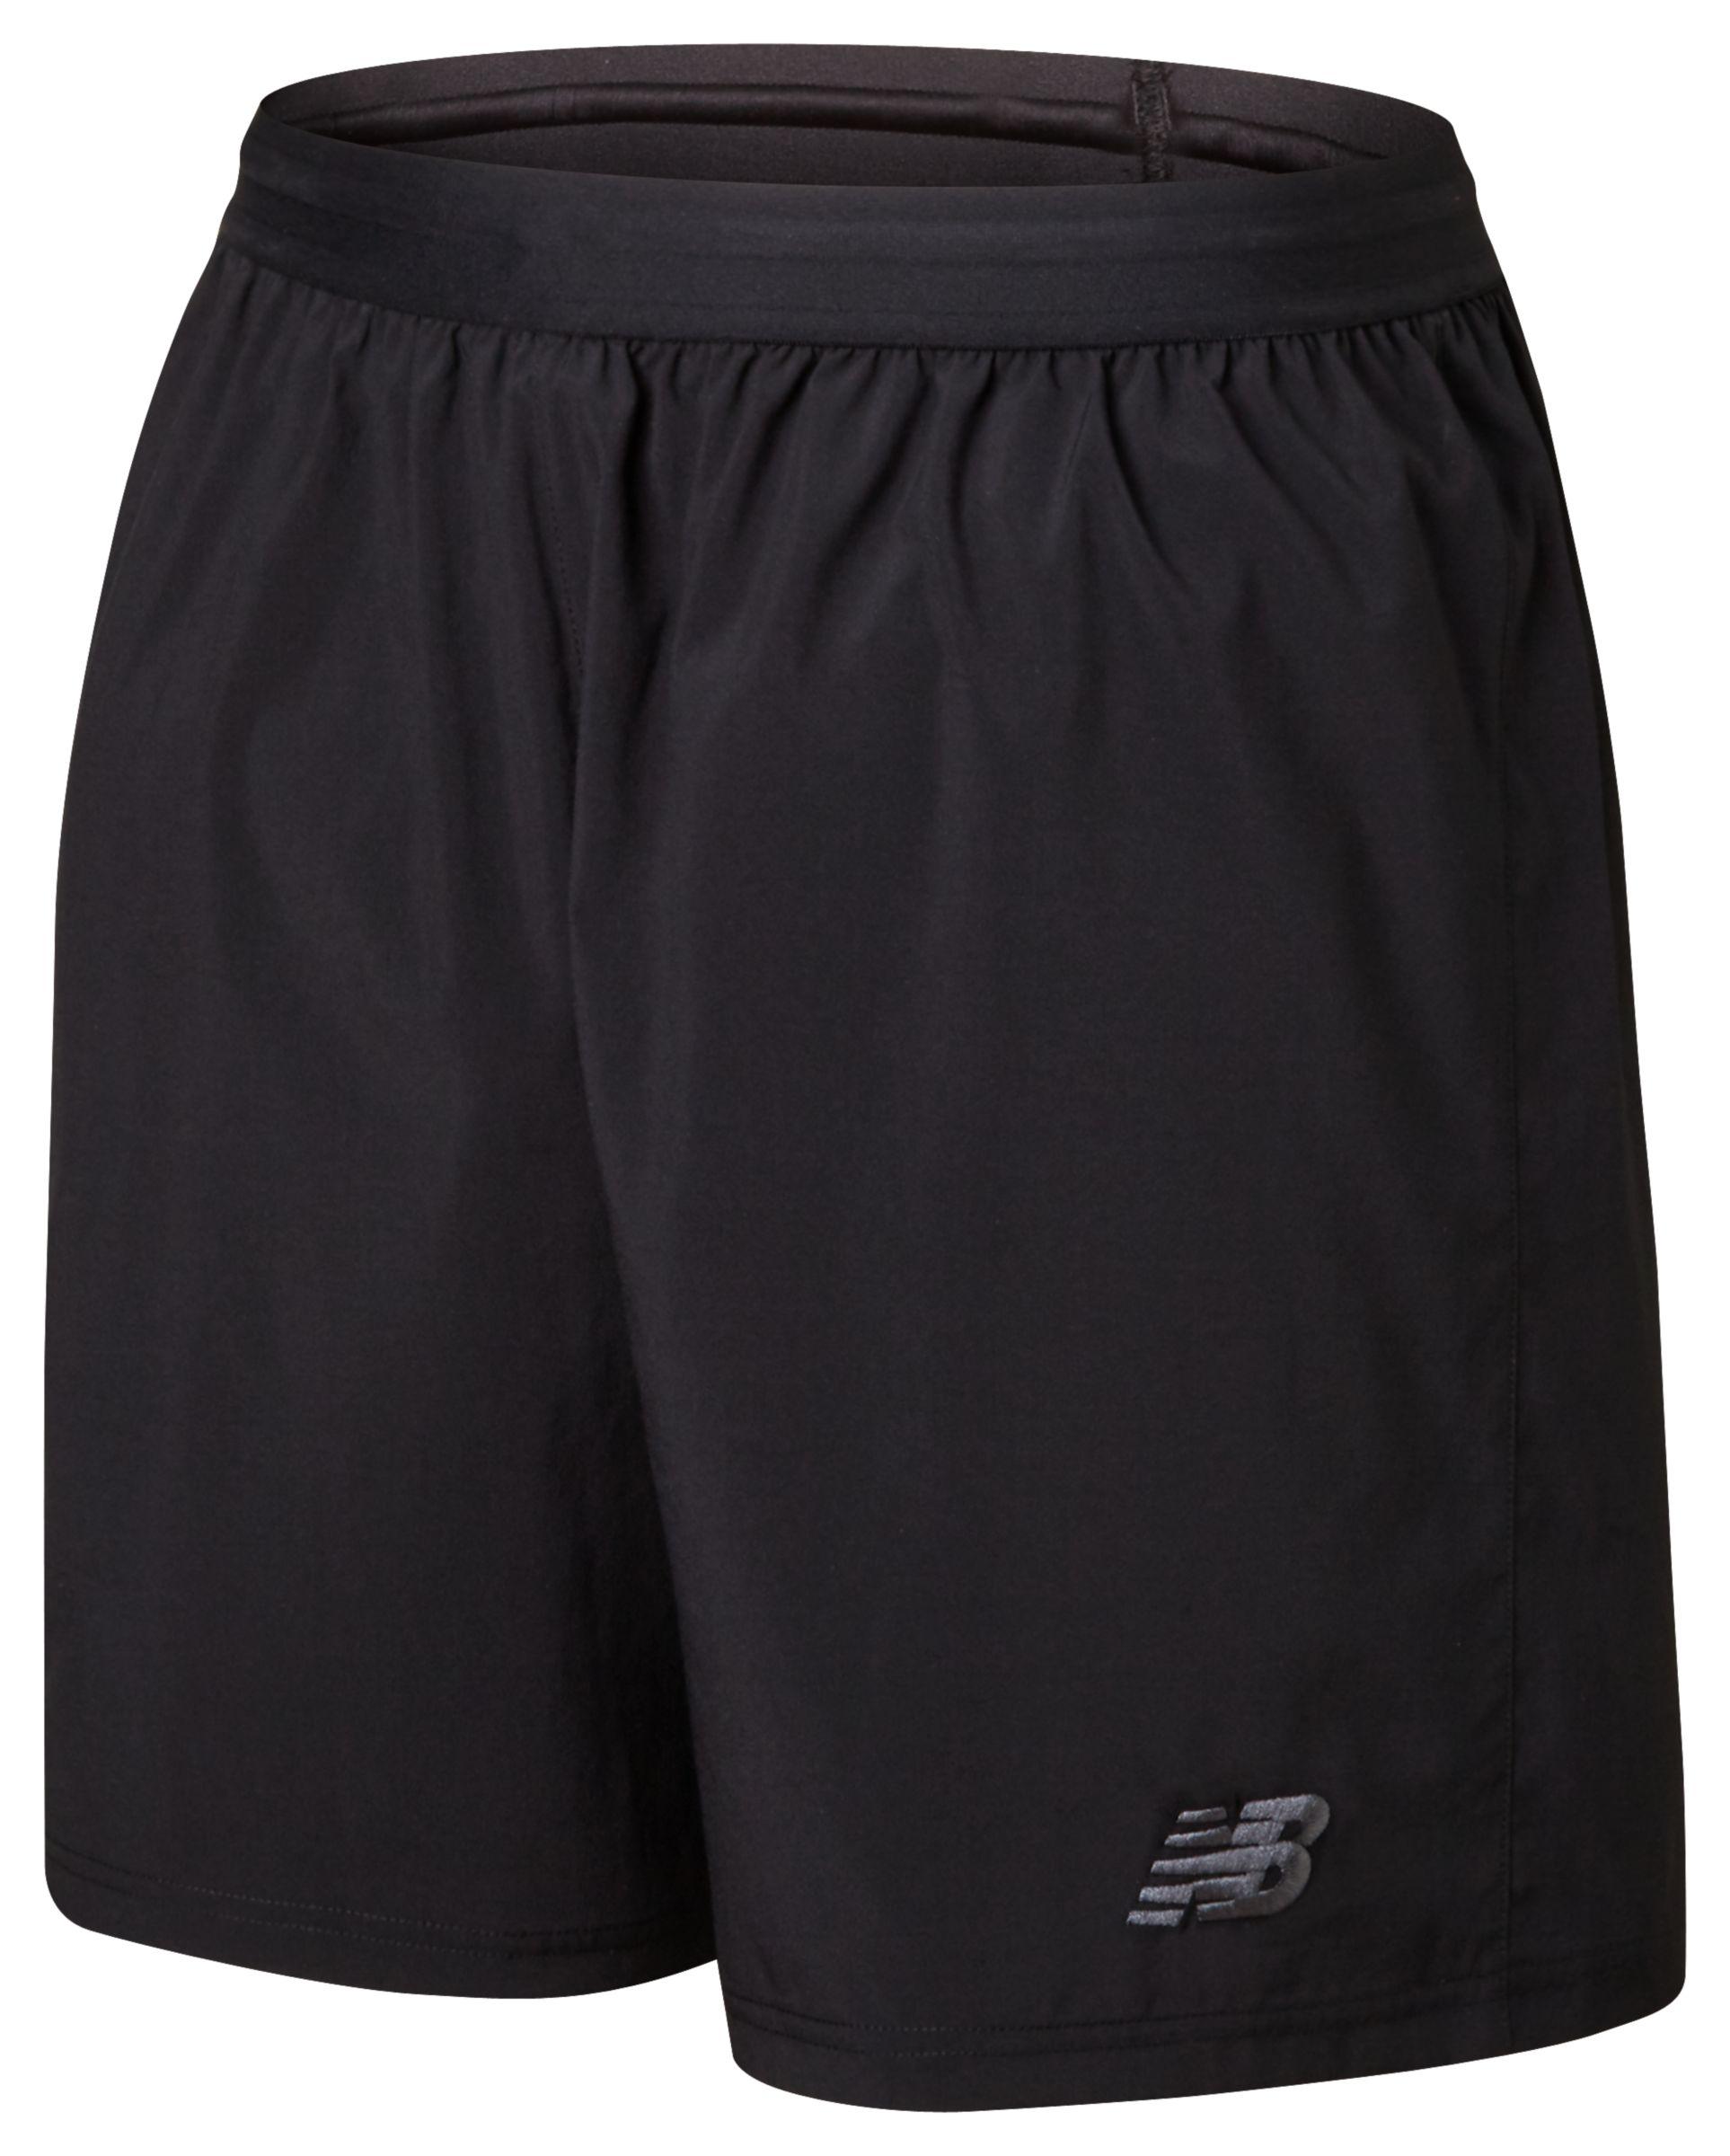 NB LFC Mens Elite Training Short, Black